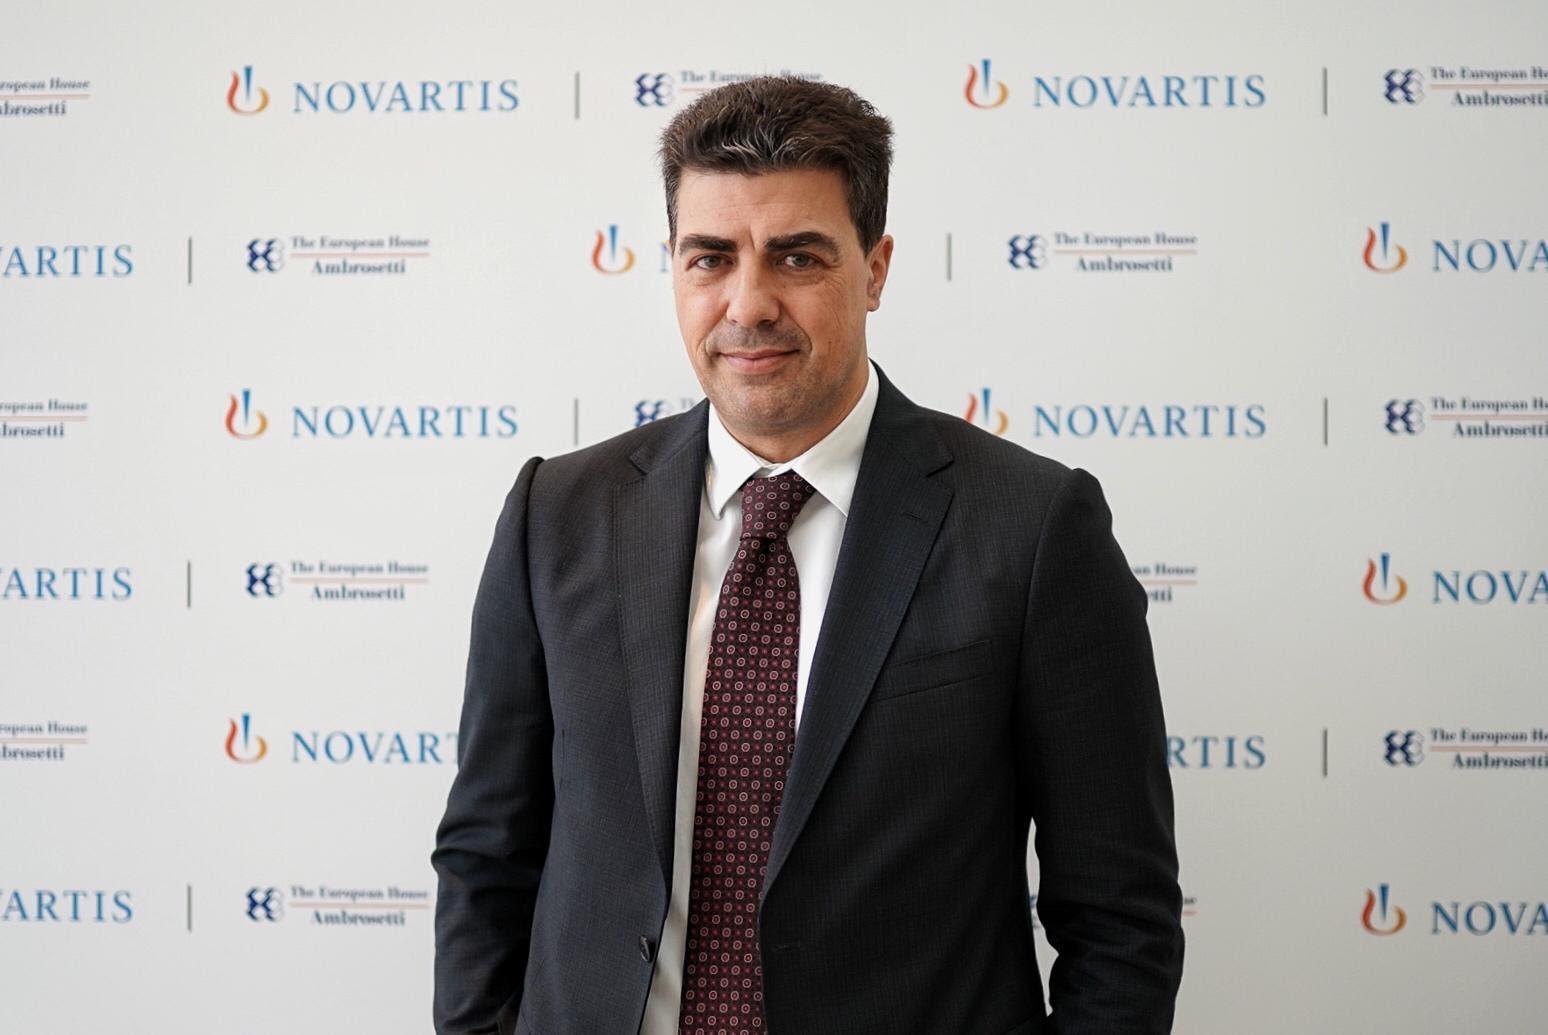 Novartis investe 200 milioni in Italia e assumerà 100 giovani under 30